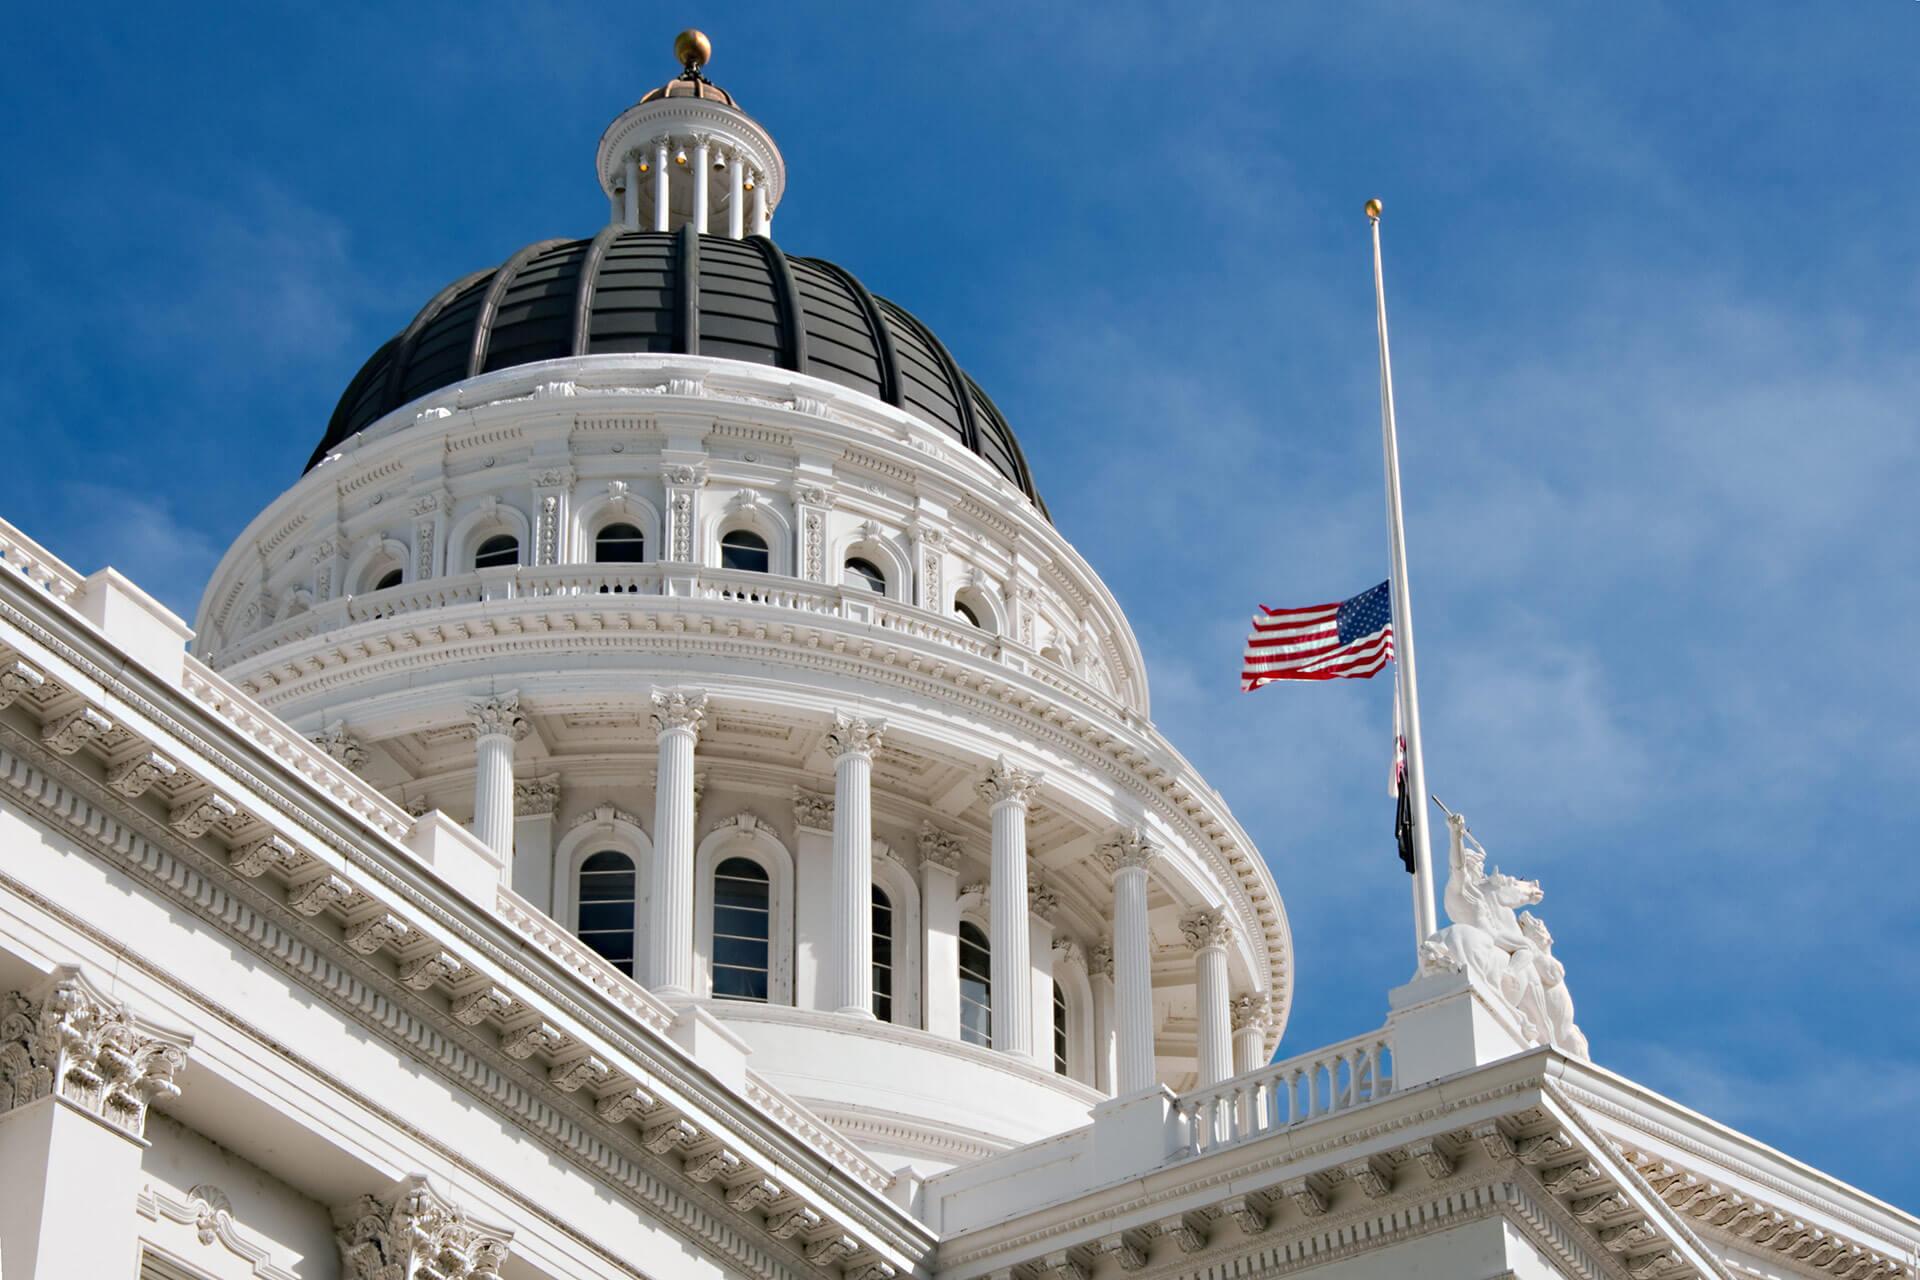 The California legislature passed Assembly Bill 1281